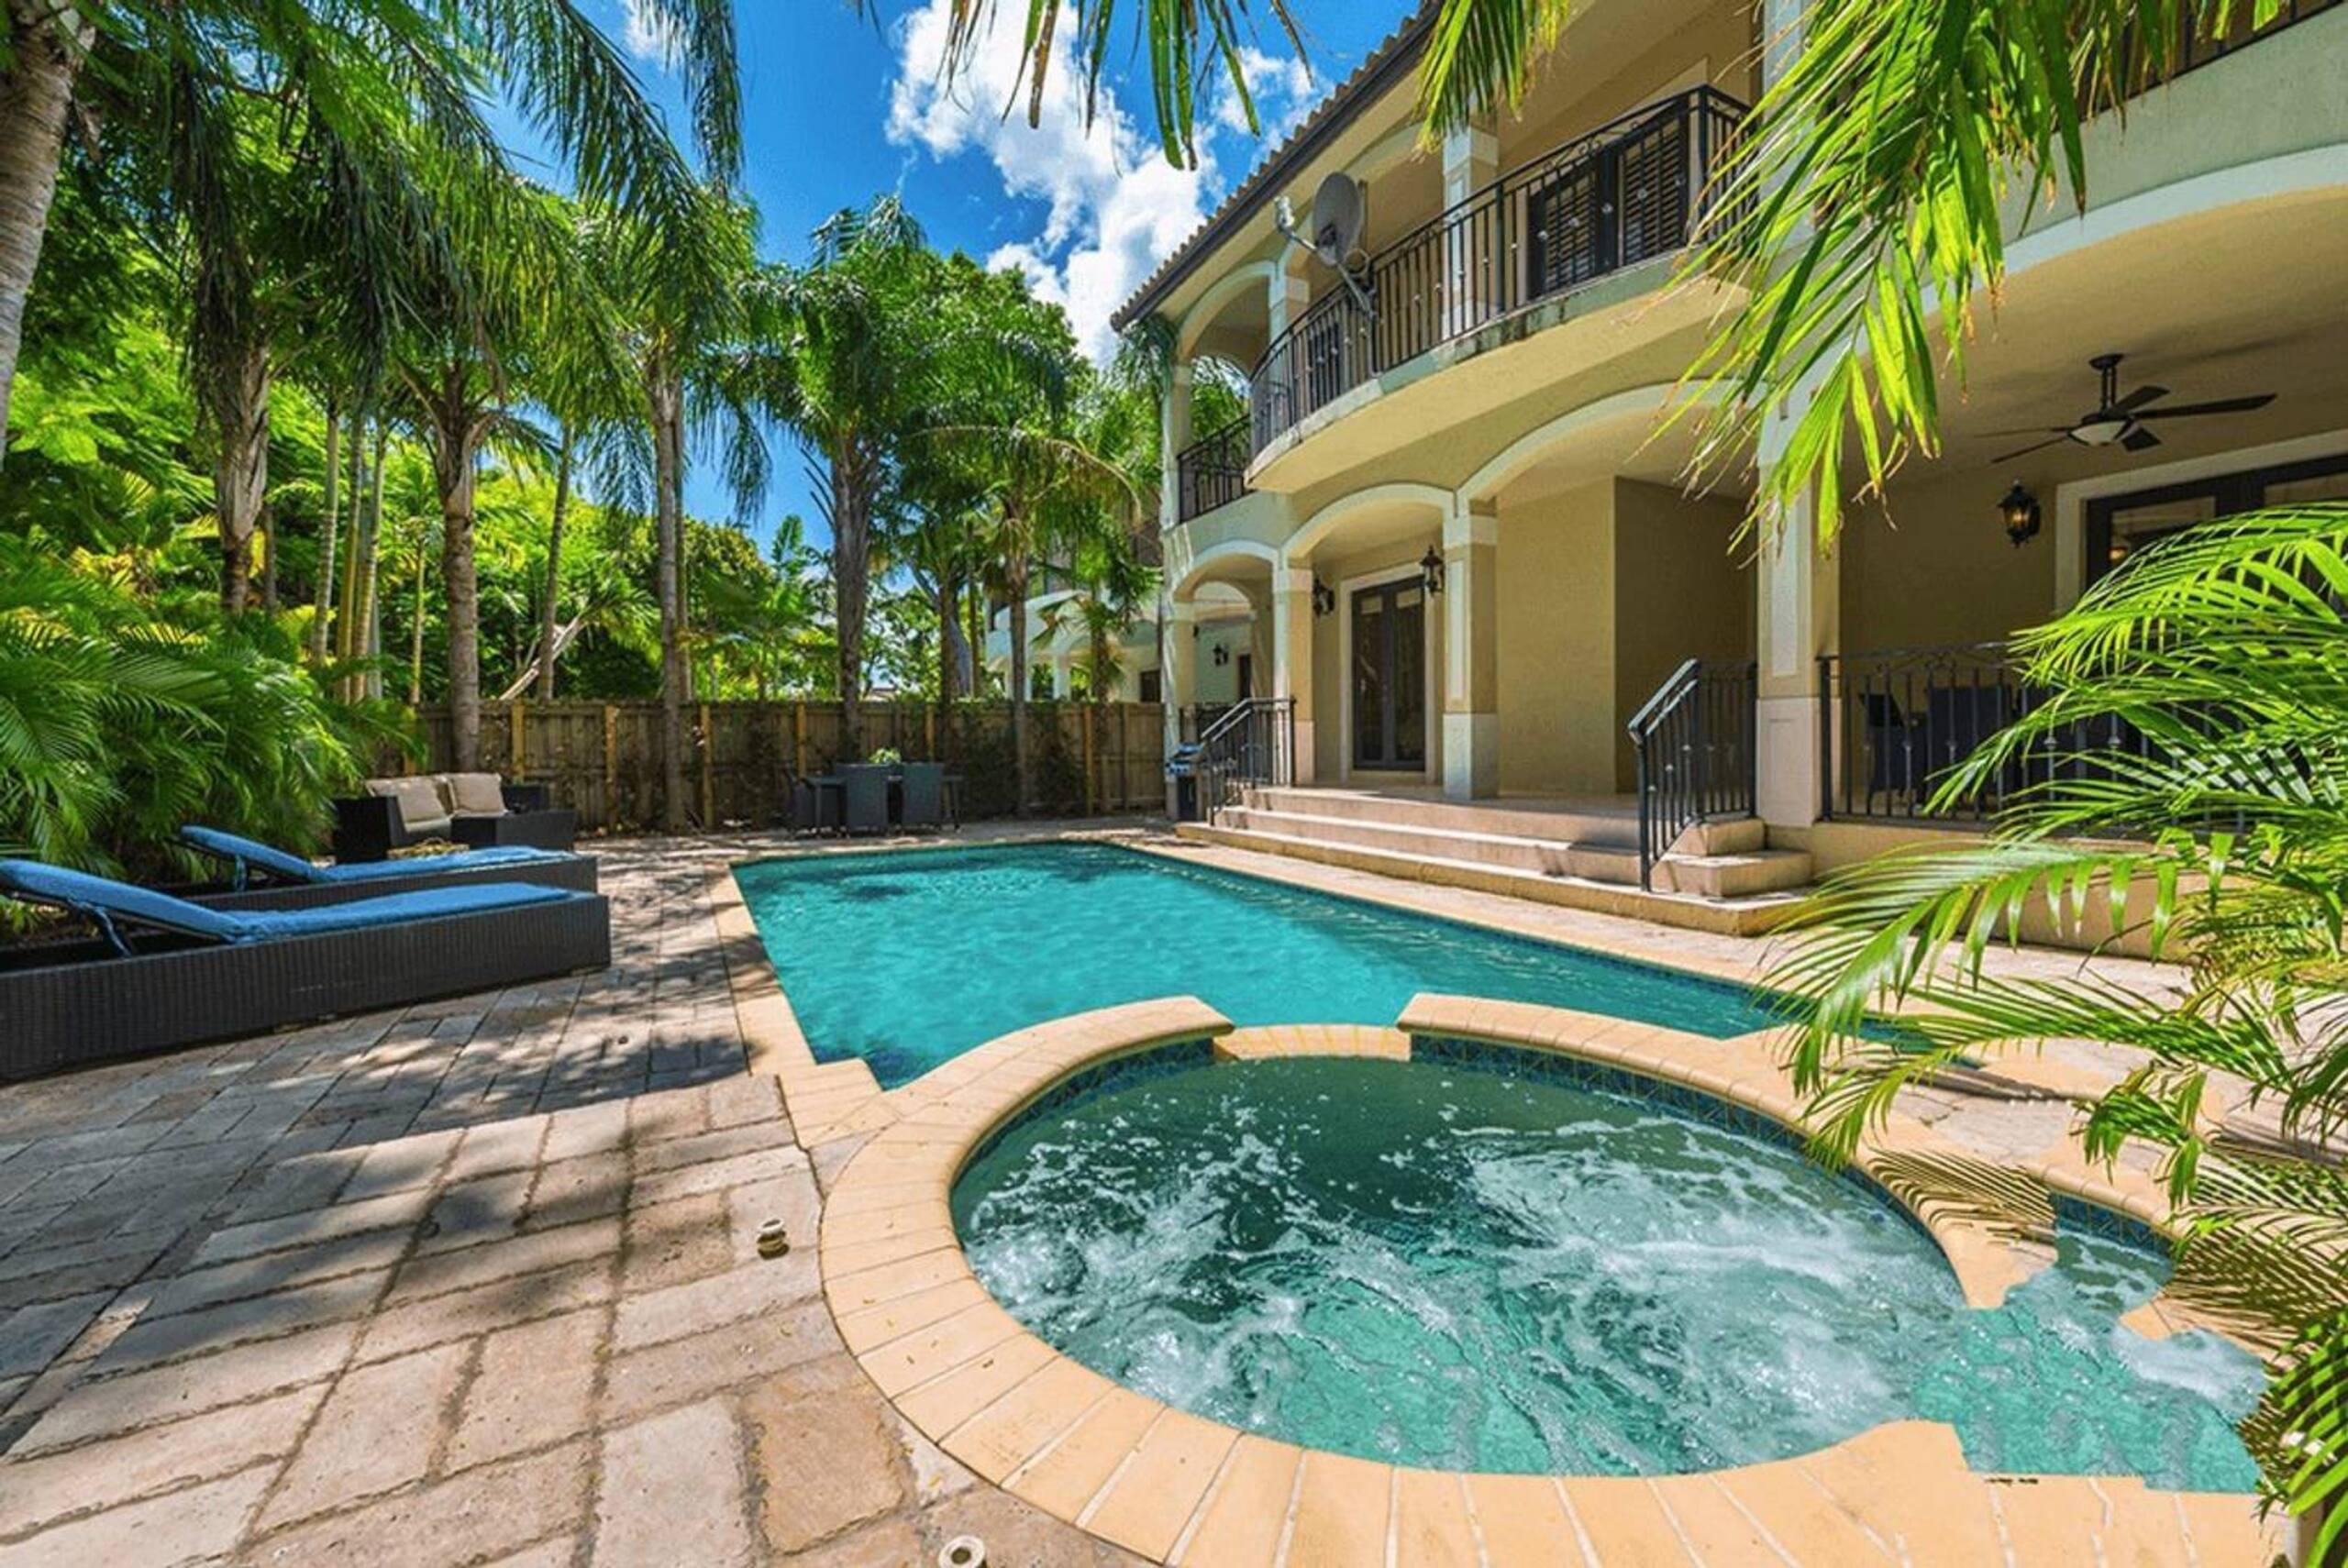 Apartment Villa Lawrence - Luxury Villa photo 22682509